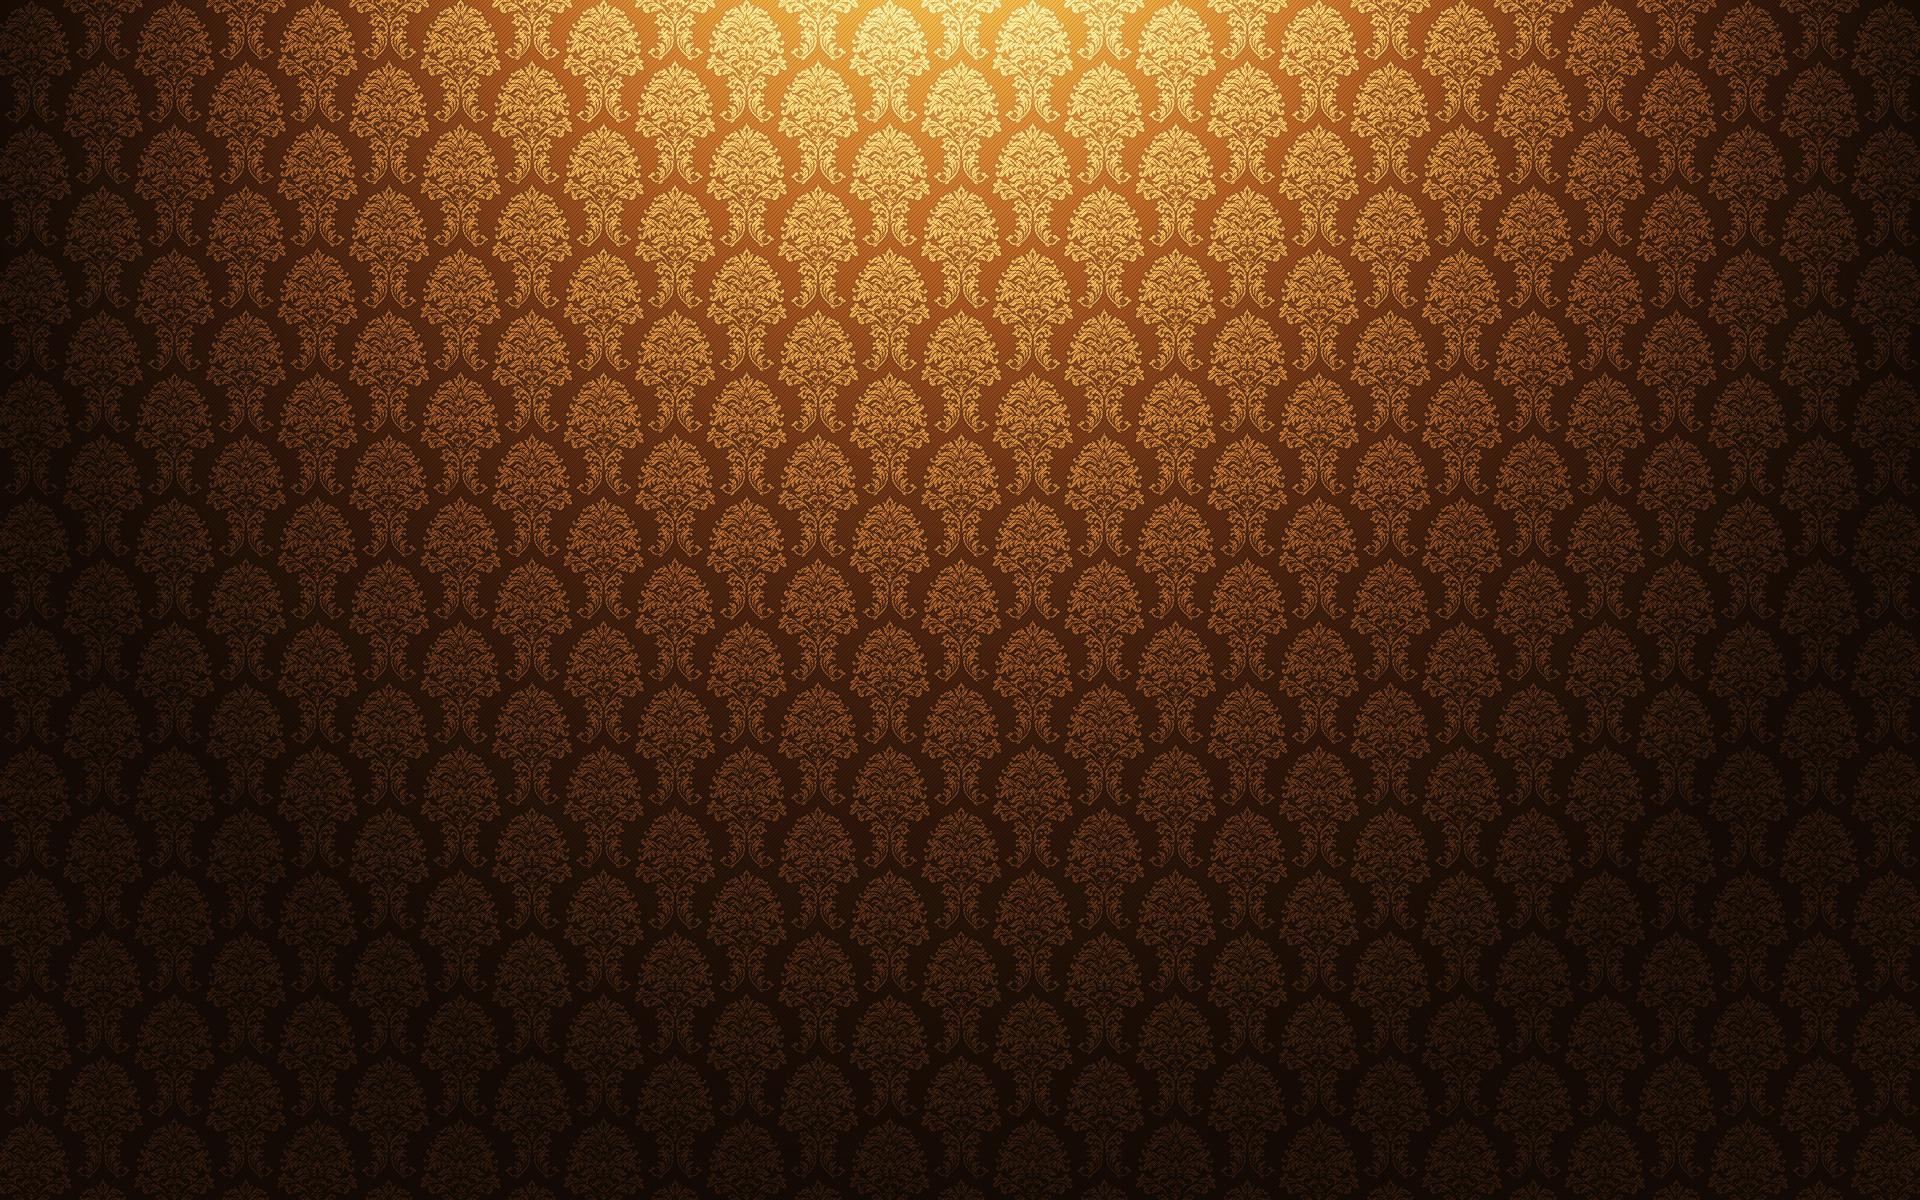 golden vintage wallpaper by eddli customization wallpaper minimalistic    Vintage Wallpaper Background